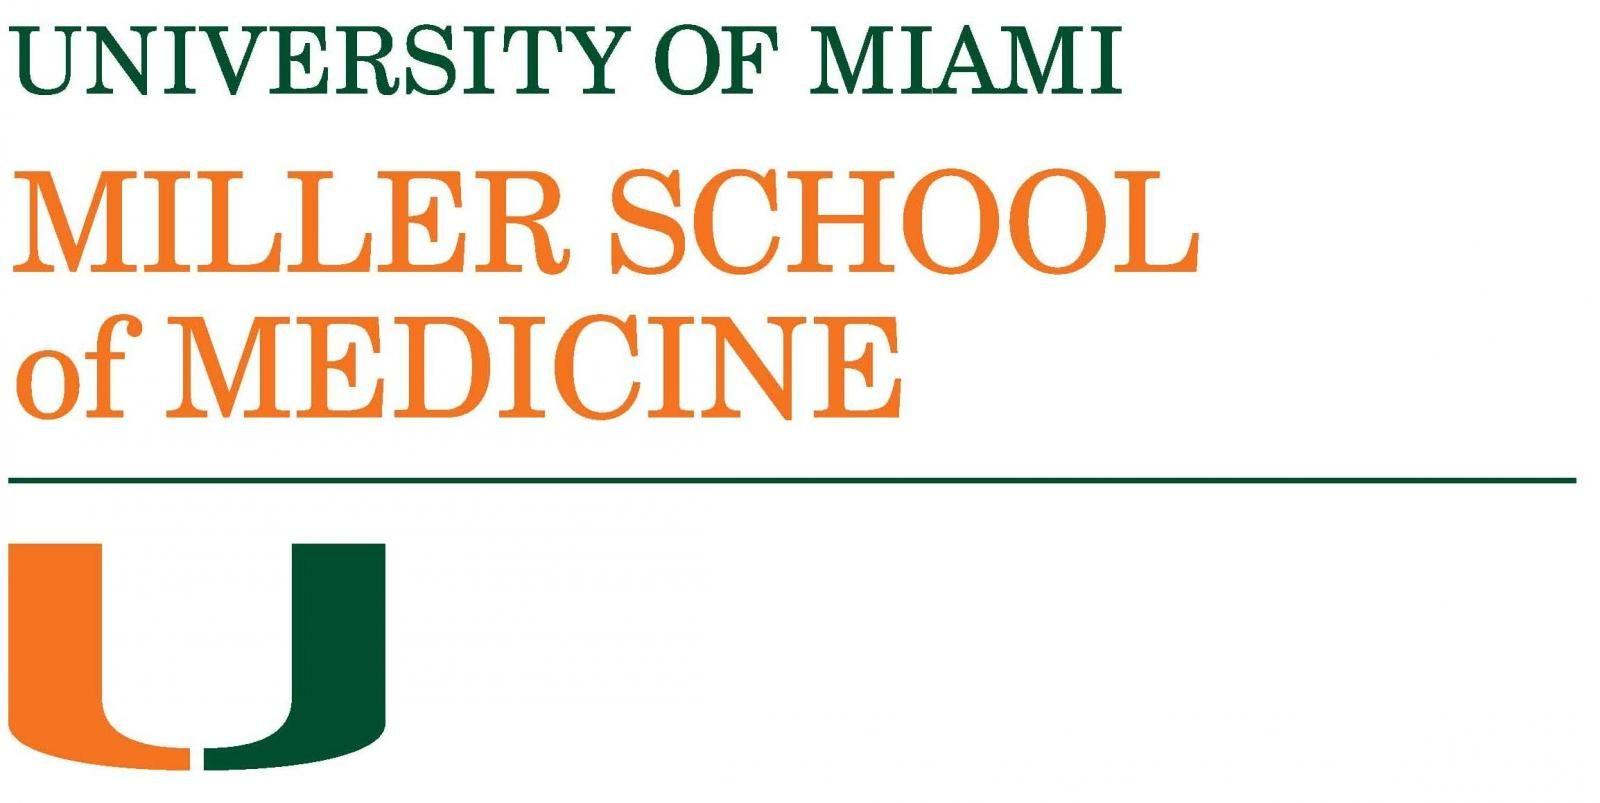 University of Miami-Miller School of Medicine logo